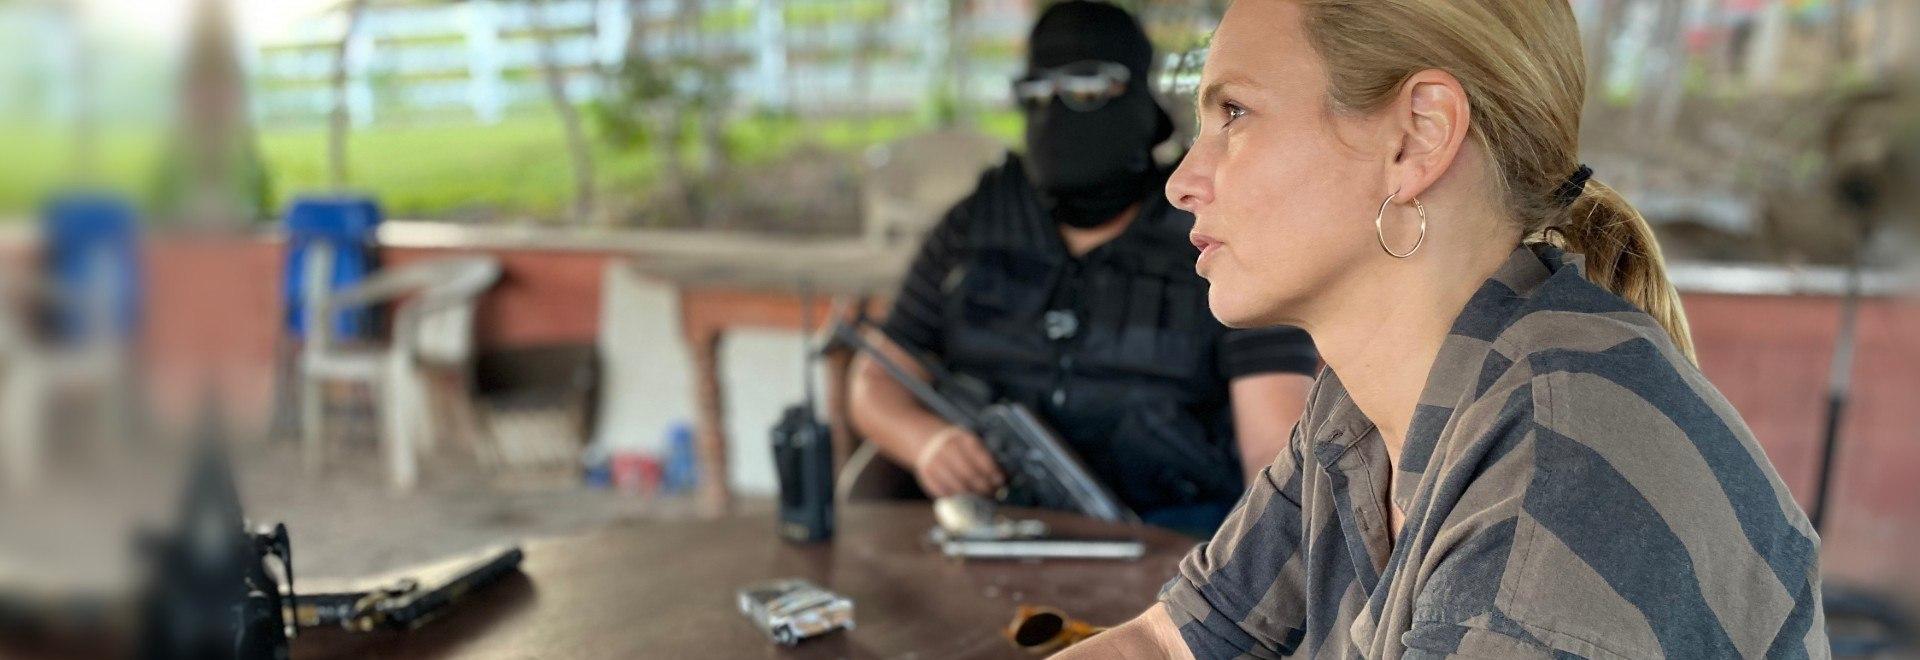 Armi: traffici illeciti